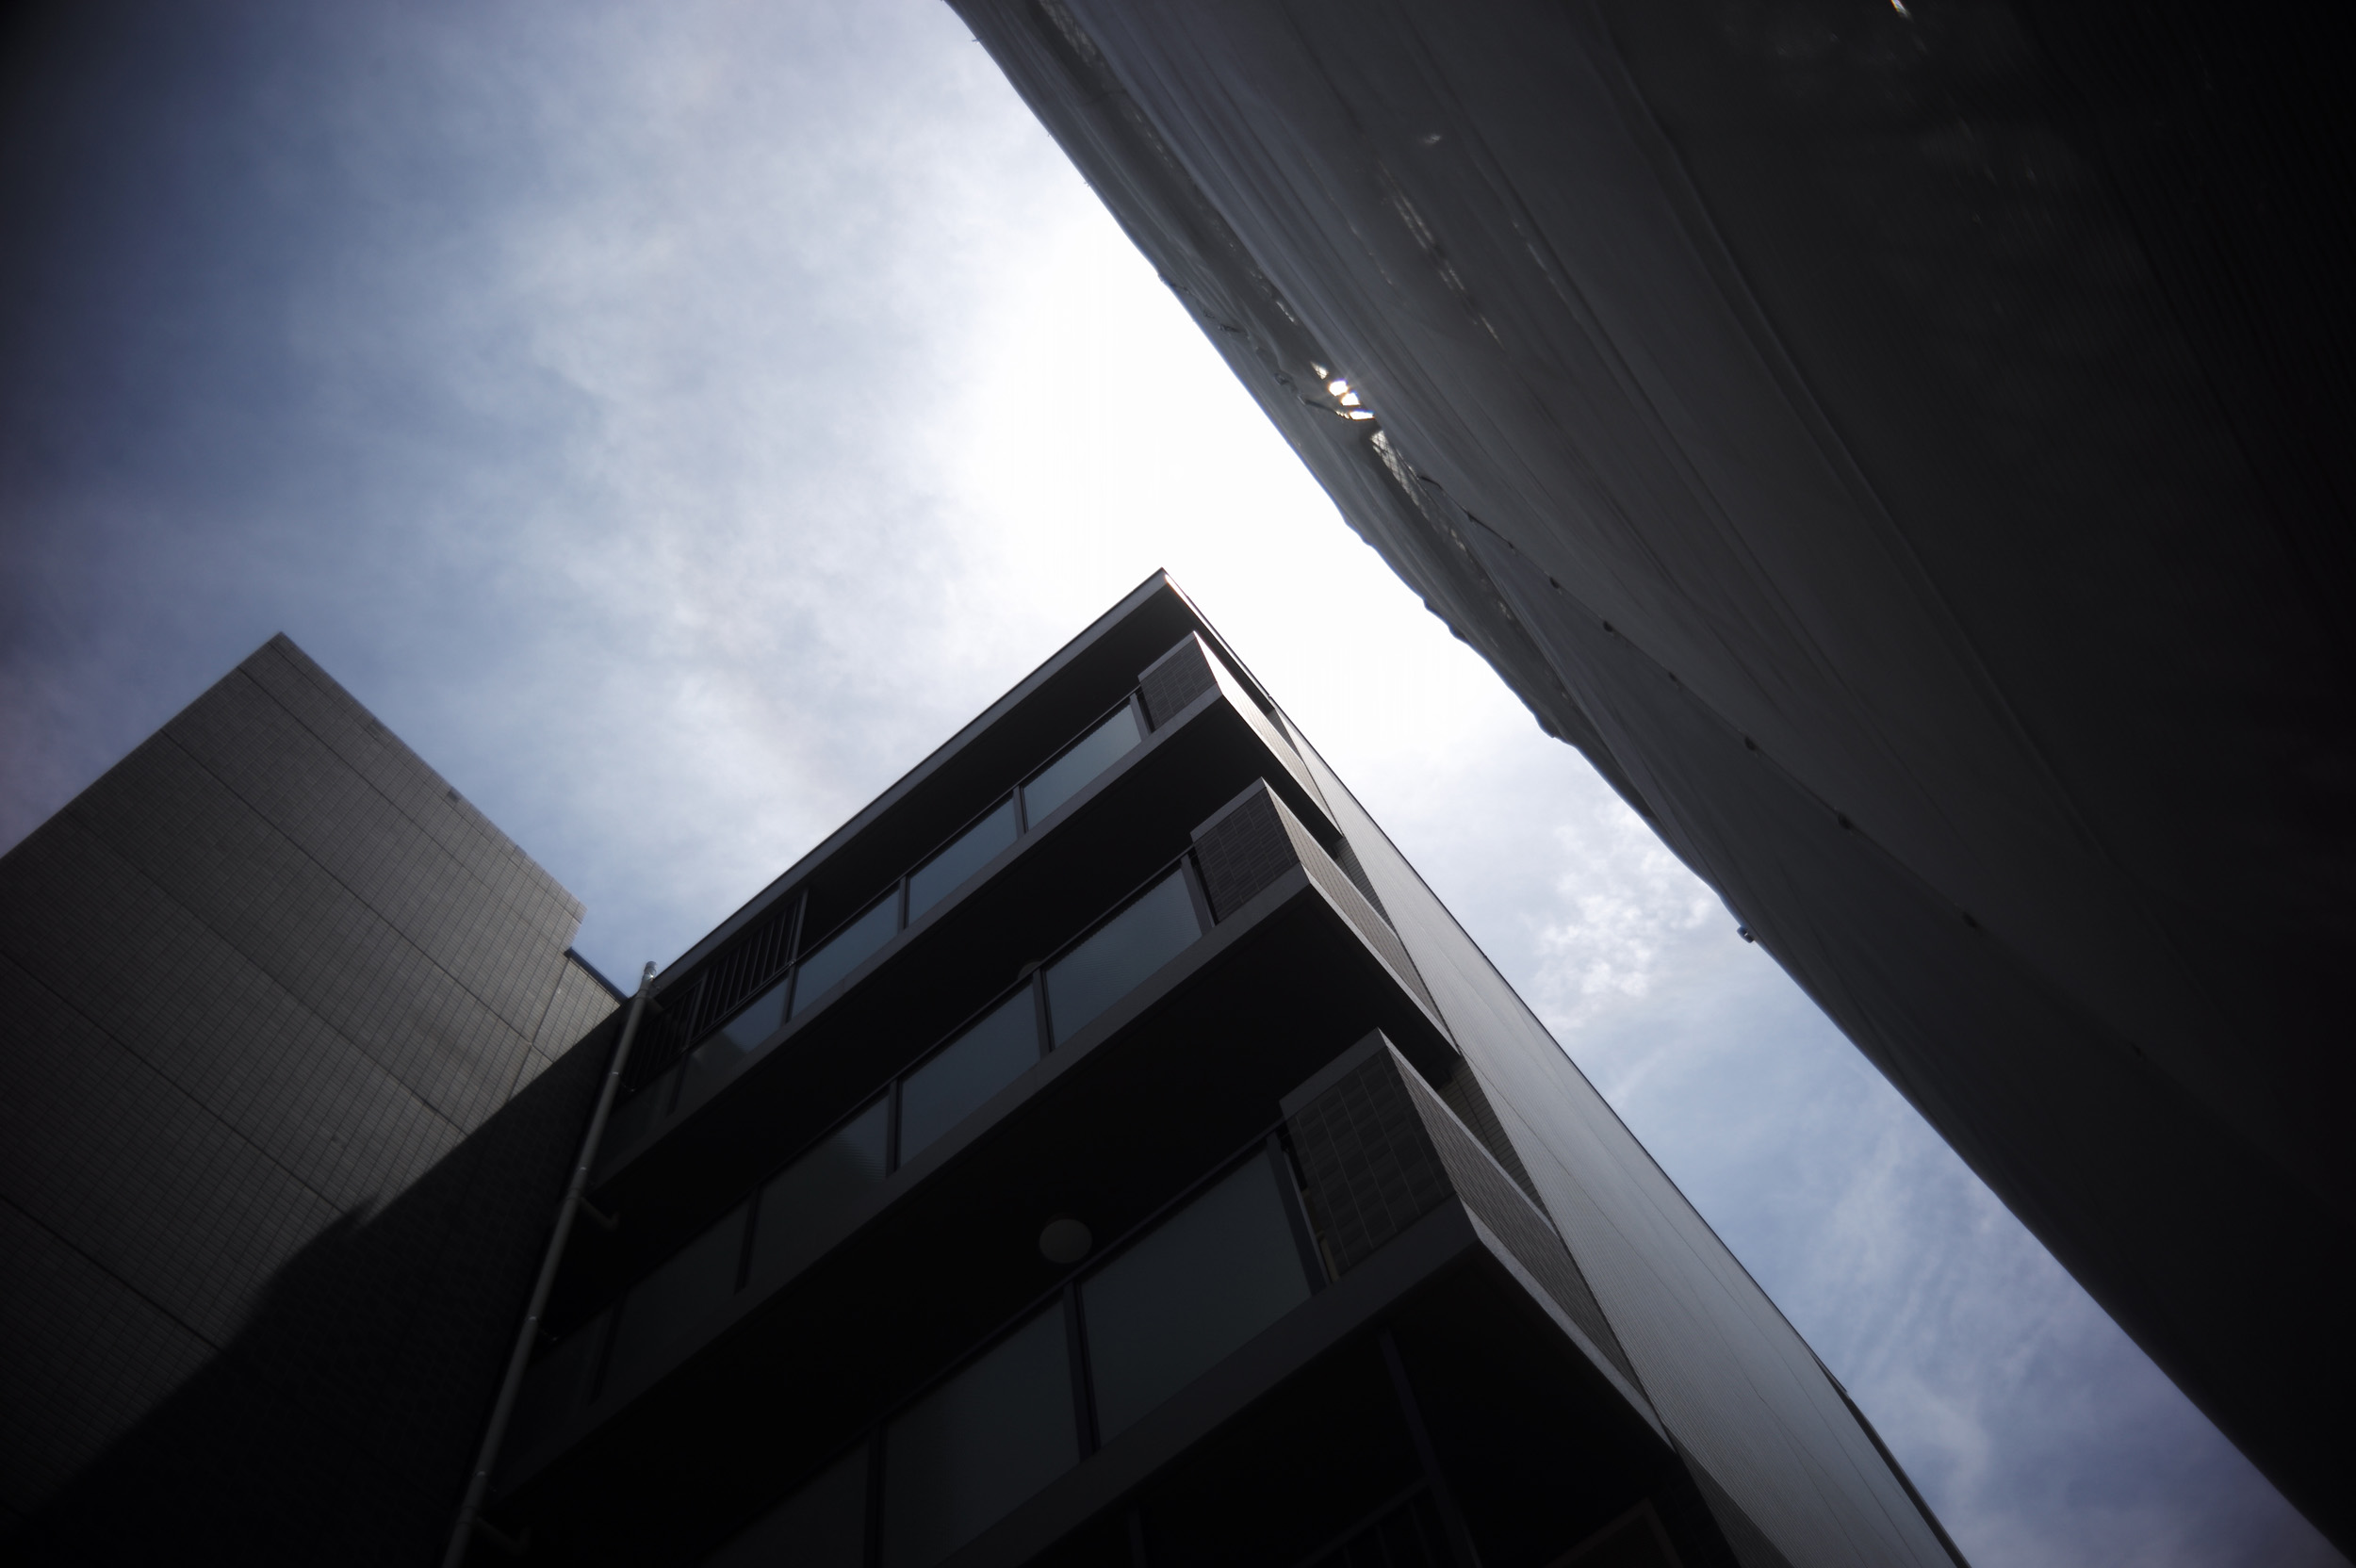 014126_09_nikon_nikkor_25mm_f4_l